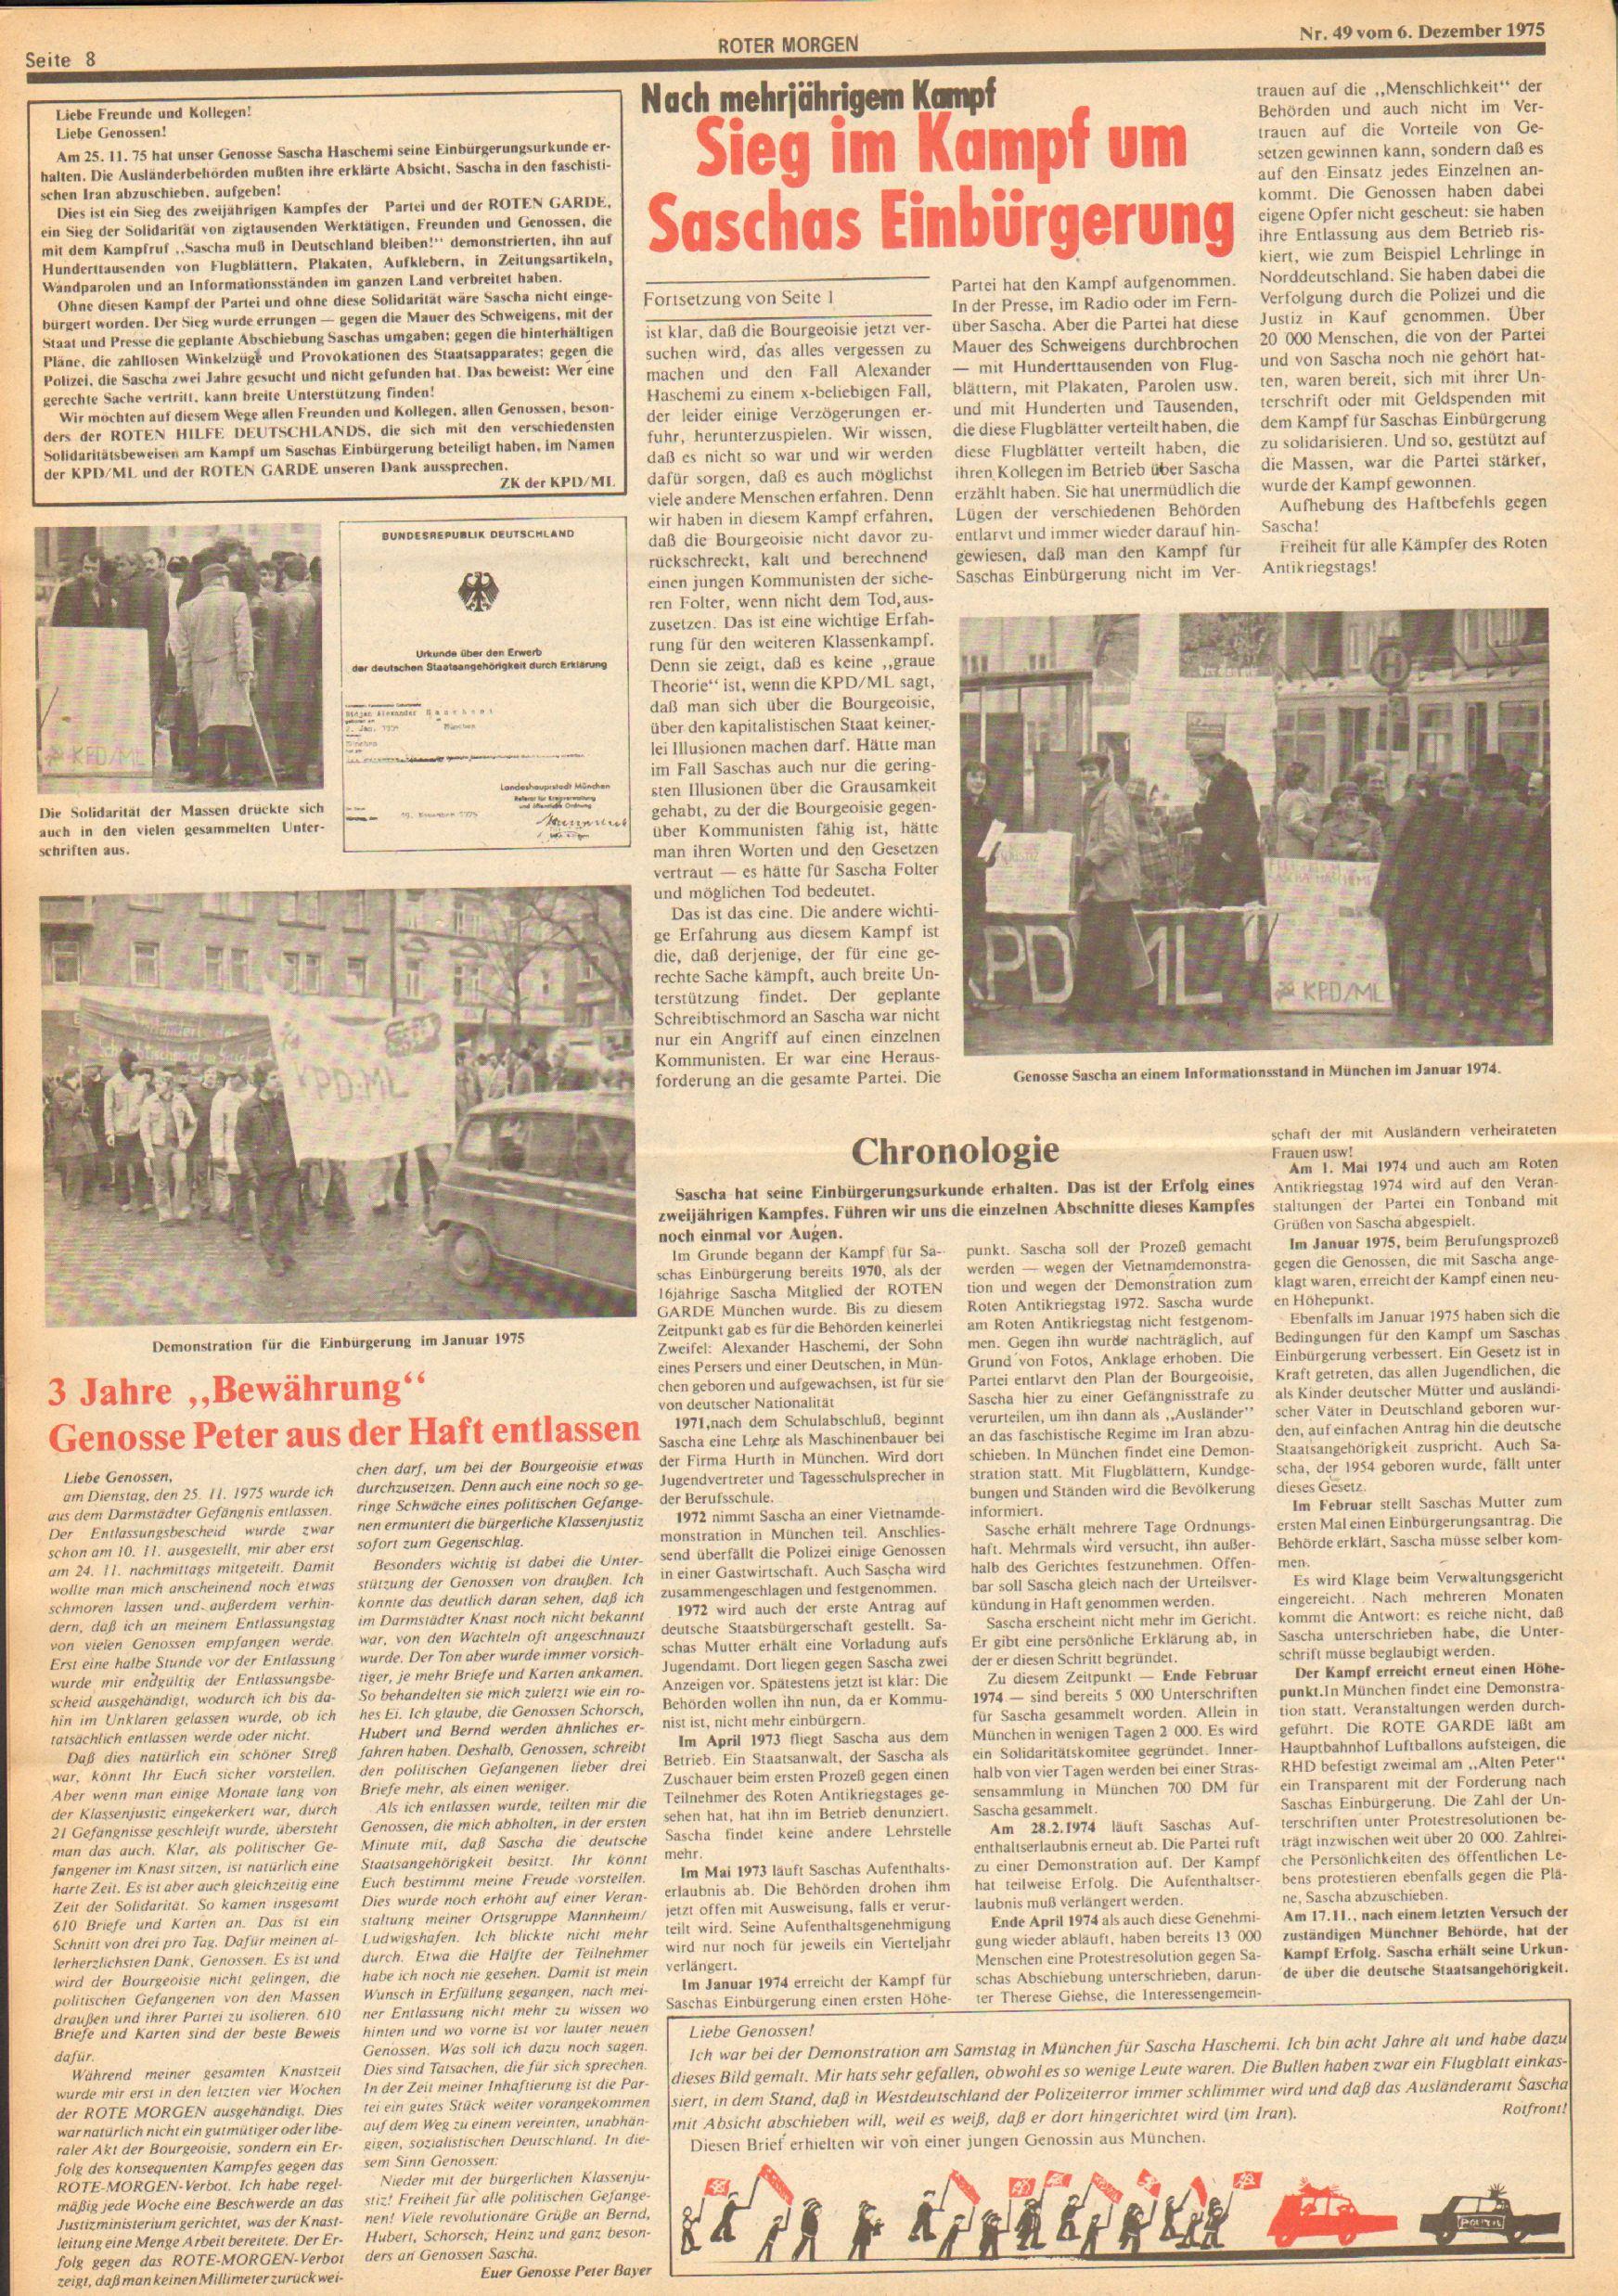 Roter Morgen, 9. Jg., 6. Dezember 1975, Nr. 49, Seite 8